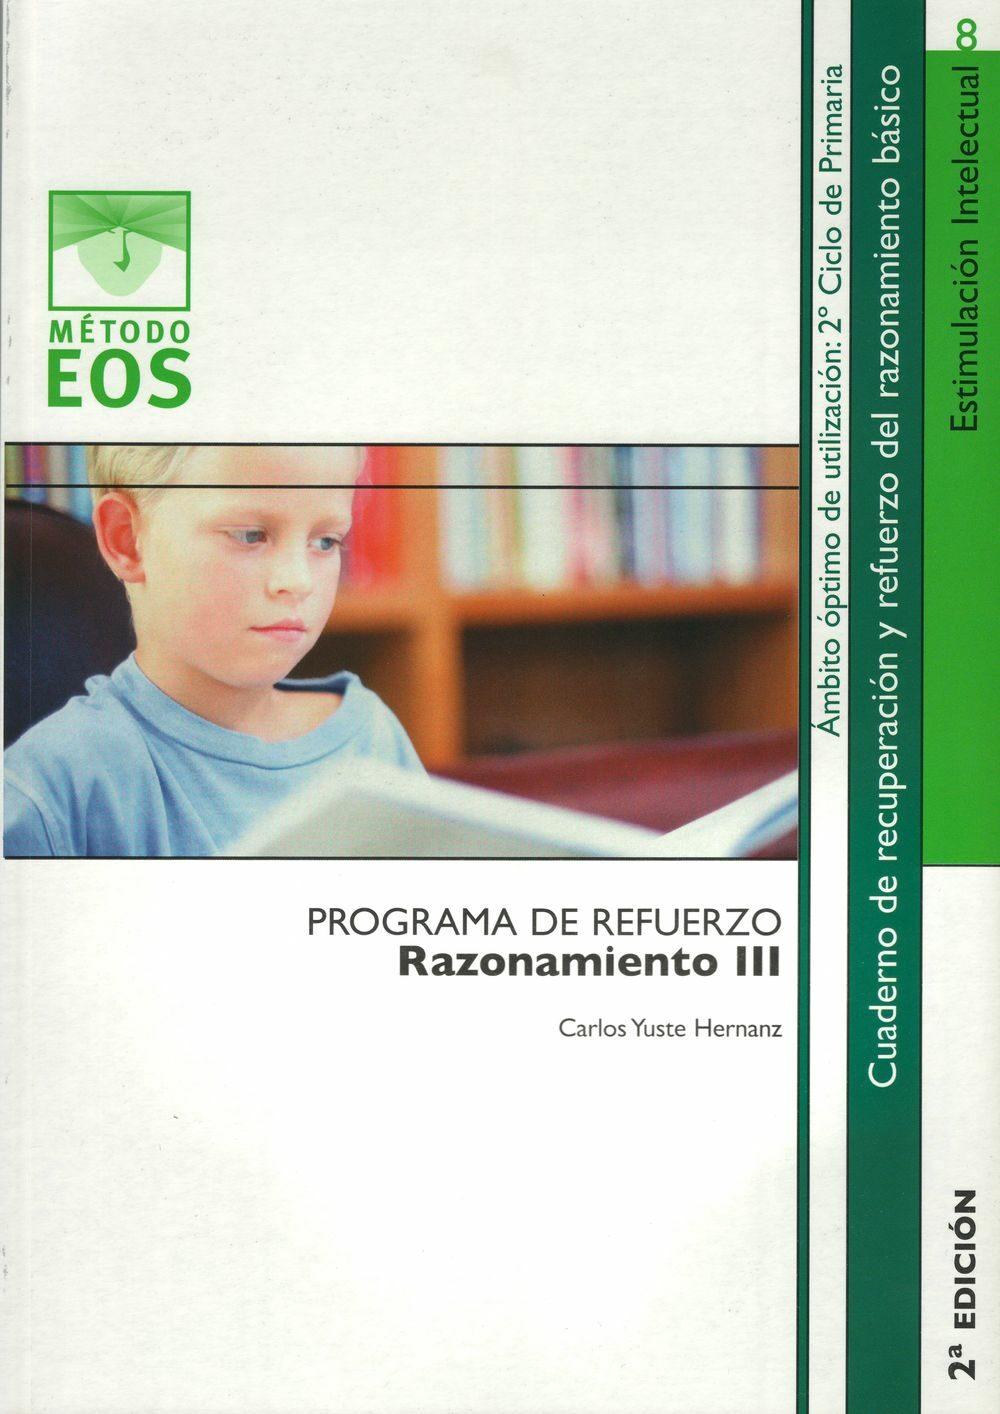 Programa De Refuerzo: Razonamiento Iii (2ª Ed.) por Carlos Yuste Hernanz epub